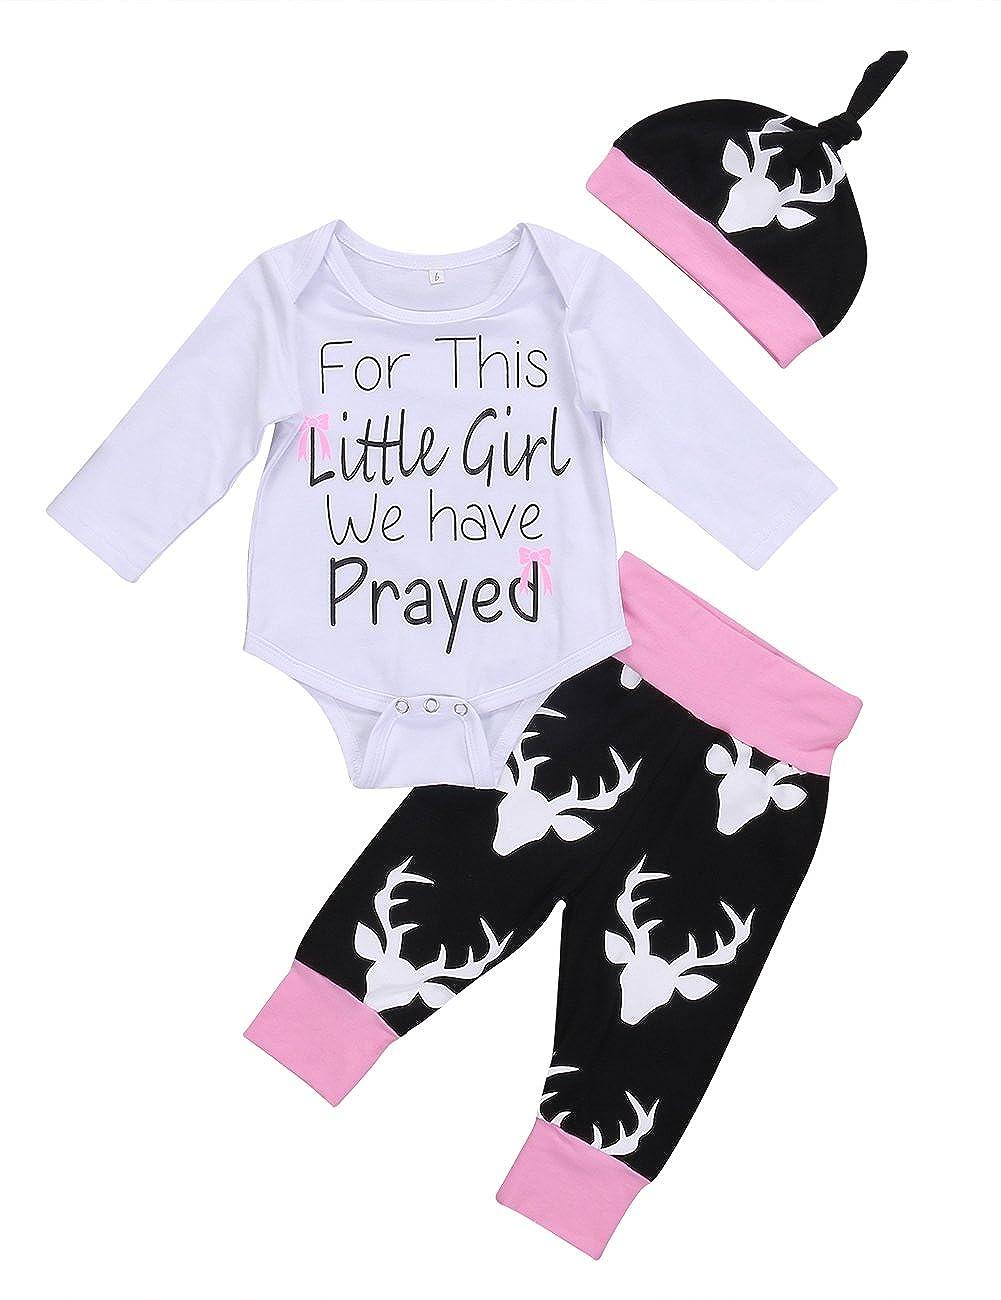 066c50cbf87 Amazon.com  Newborn Kids Baby Girls Letters Print Romper Deer Pants Hat  3Pcs Outfits Set Clothes  Clothing